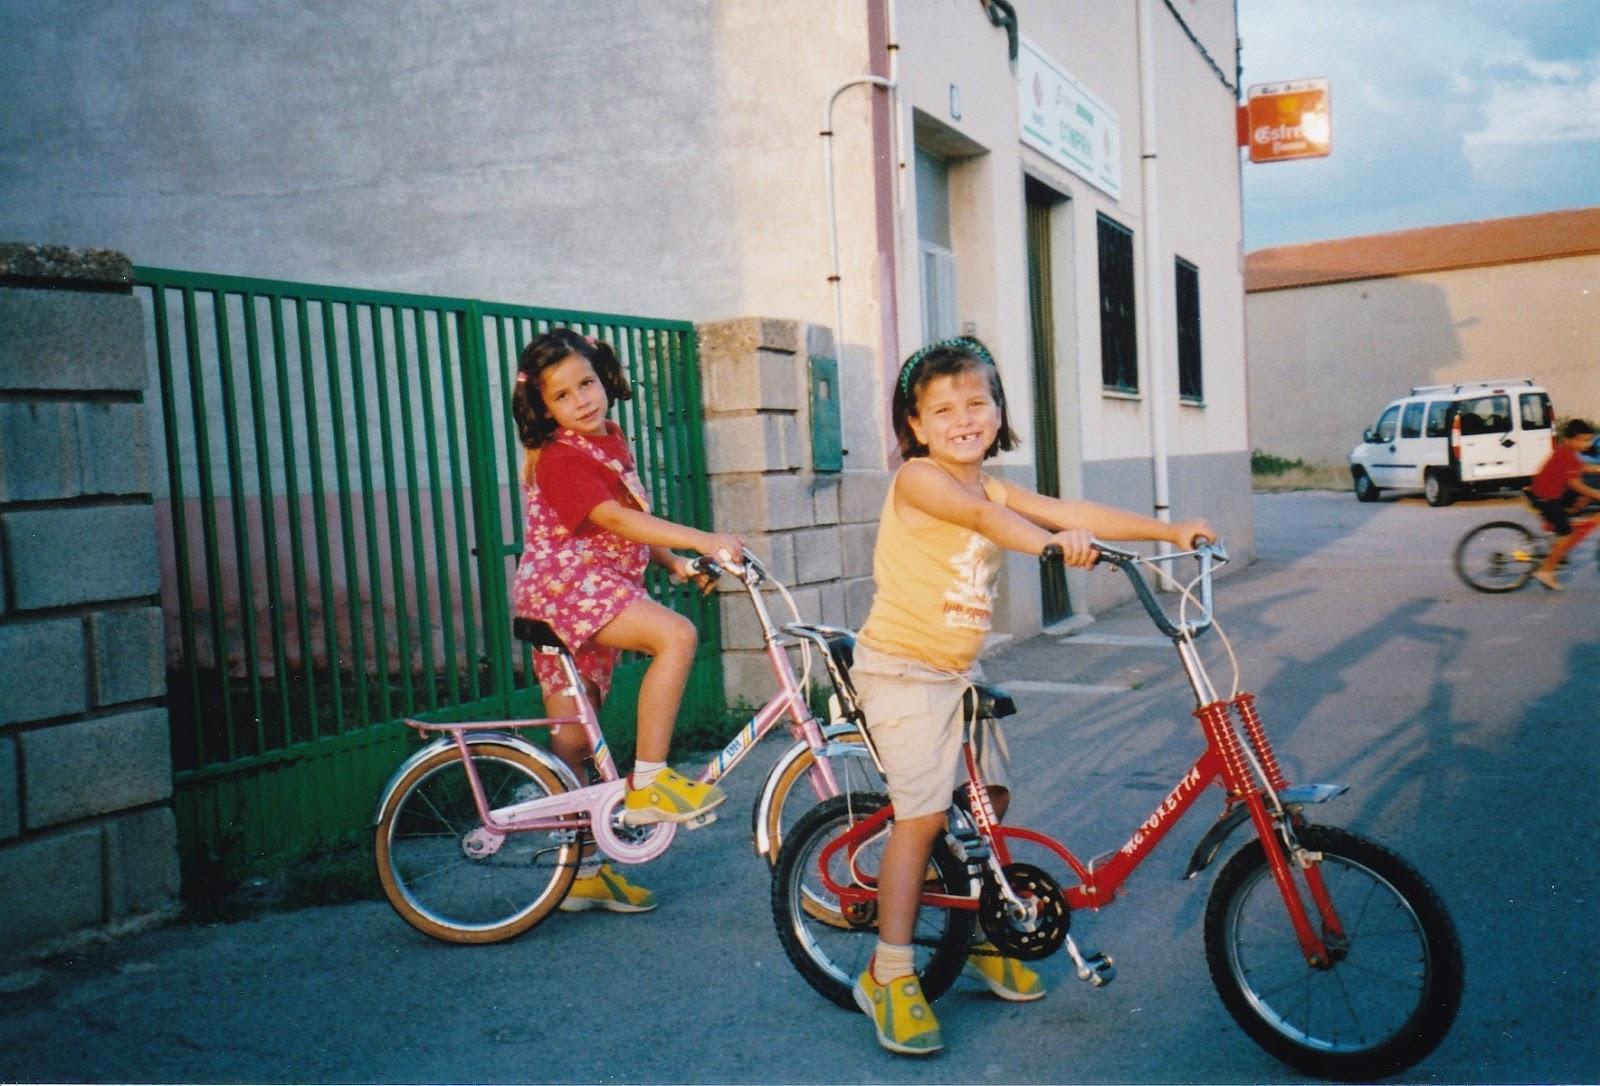 Pedaleando la bicicleta azul de amanda - La bici azul ...